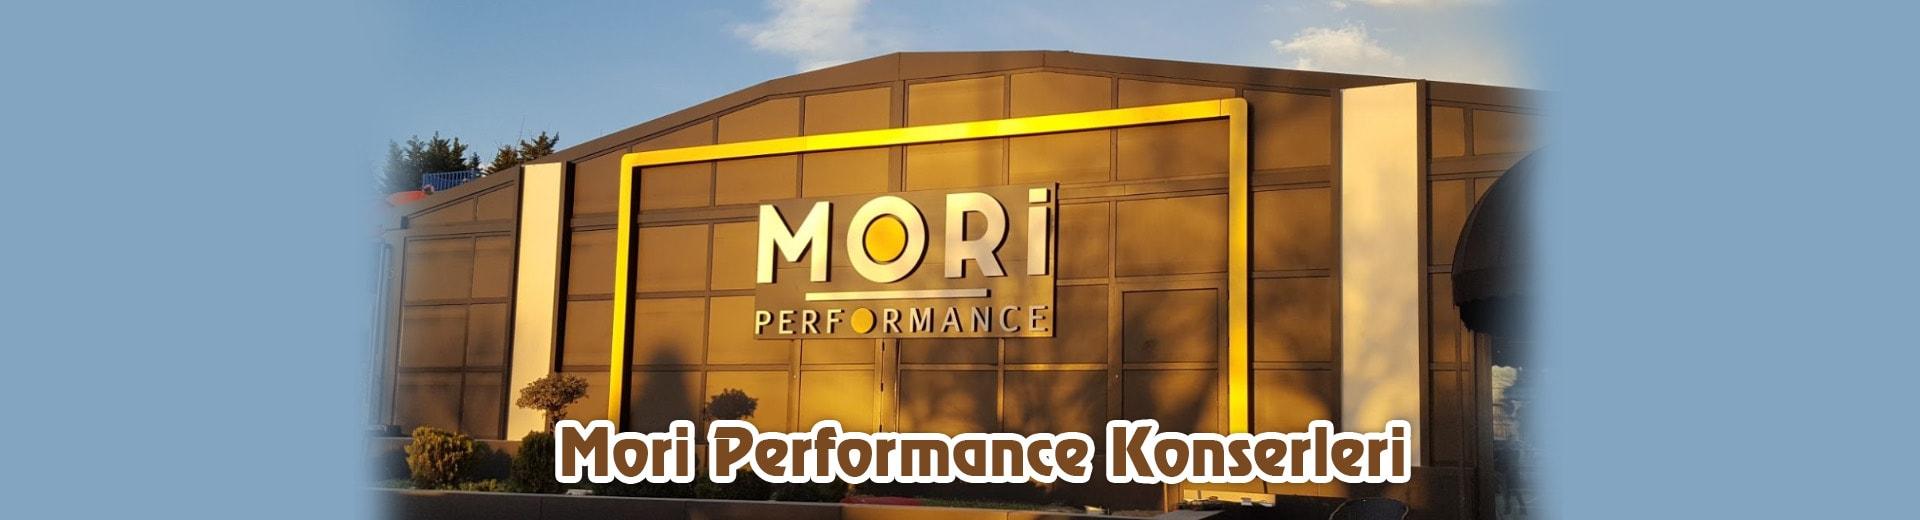 Maltepe Mori Performance Konserleri